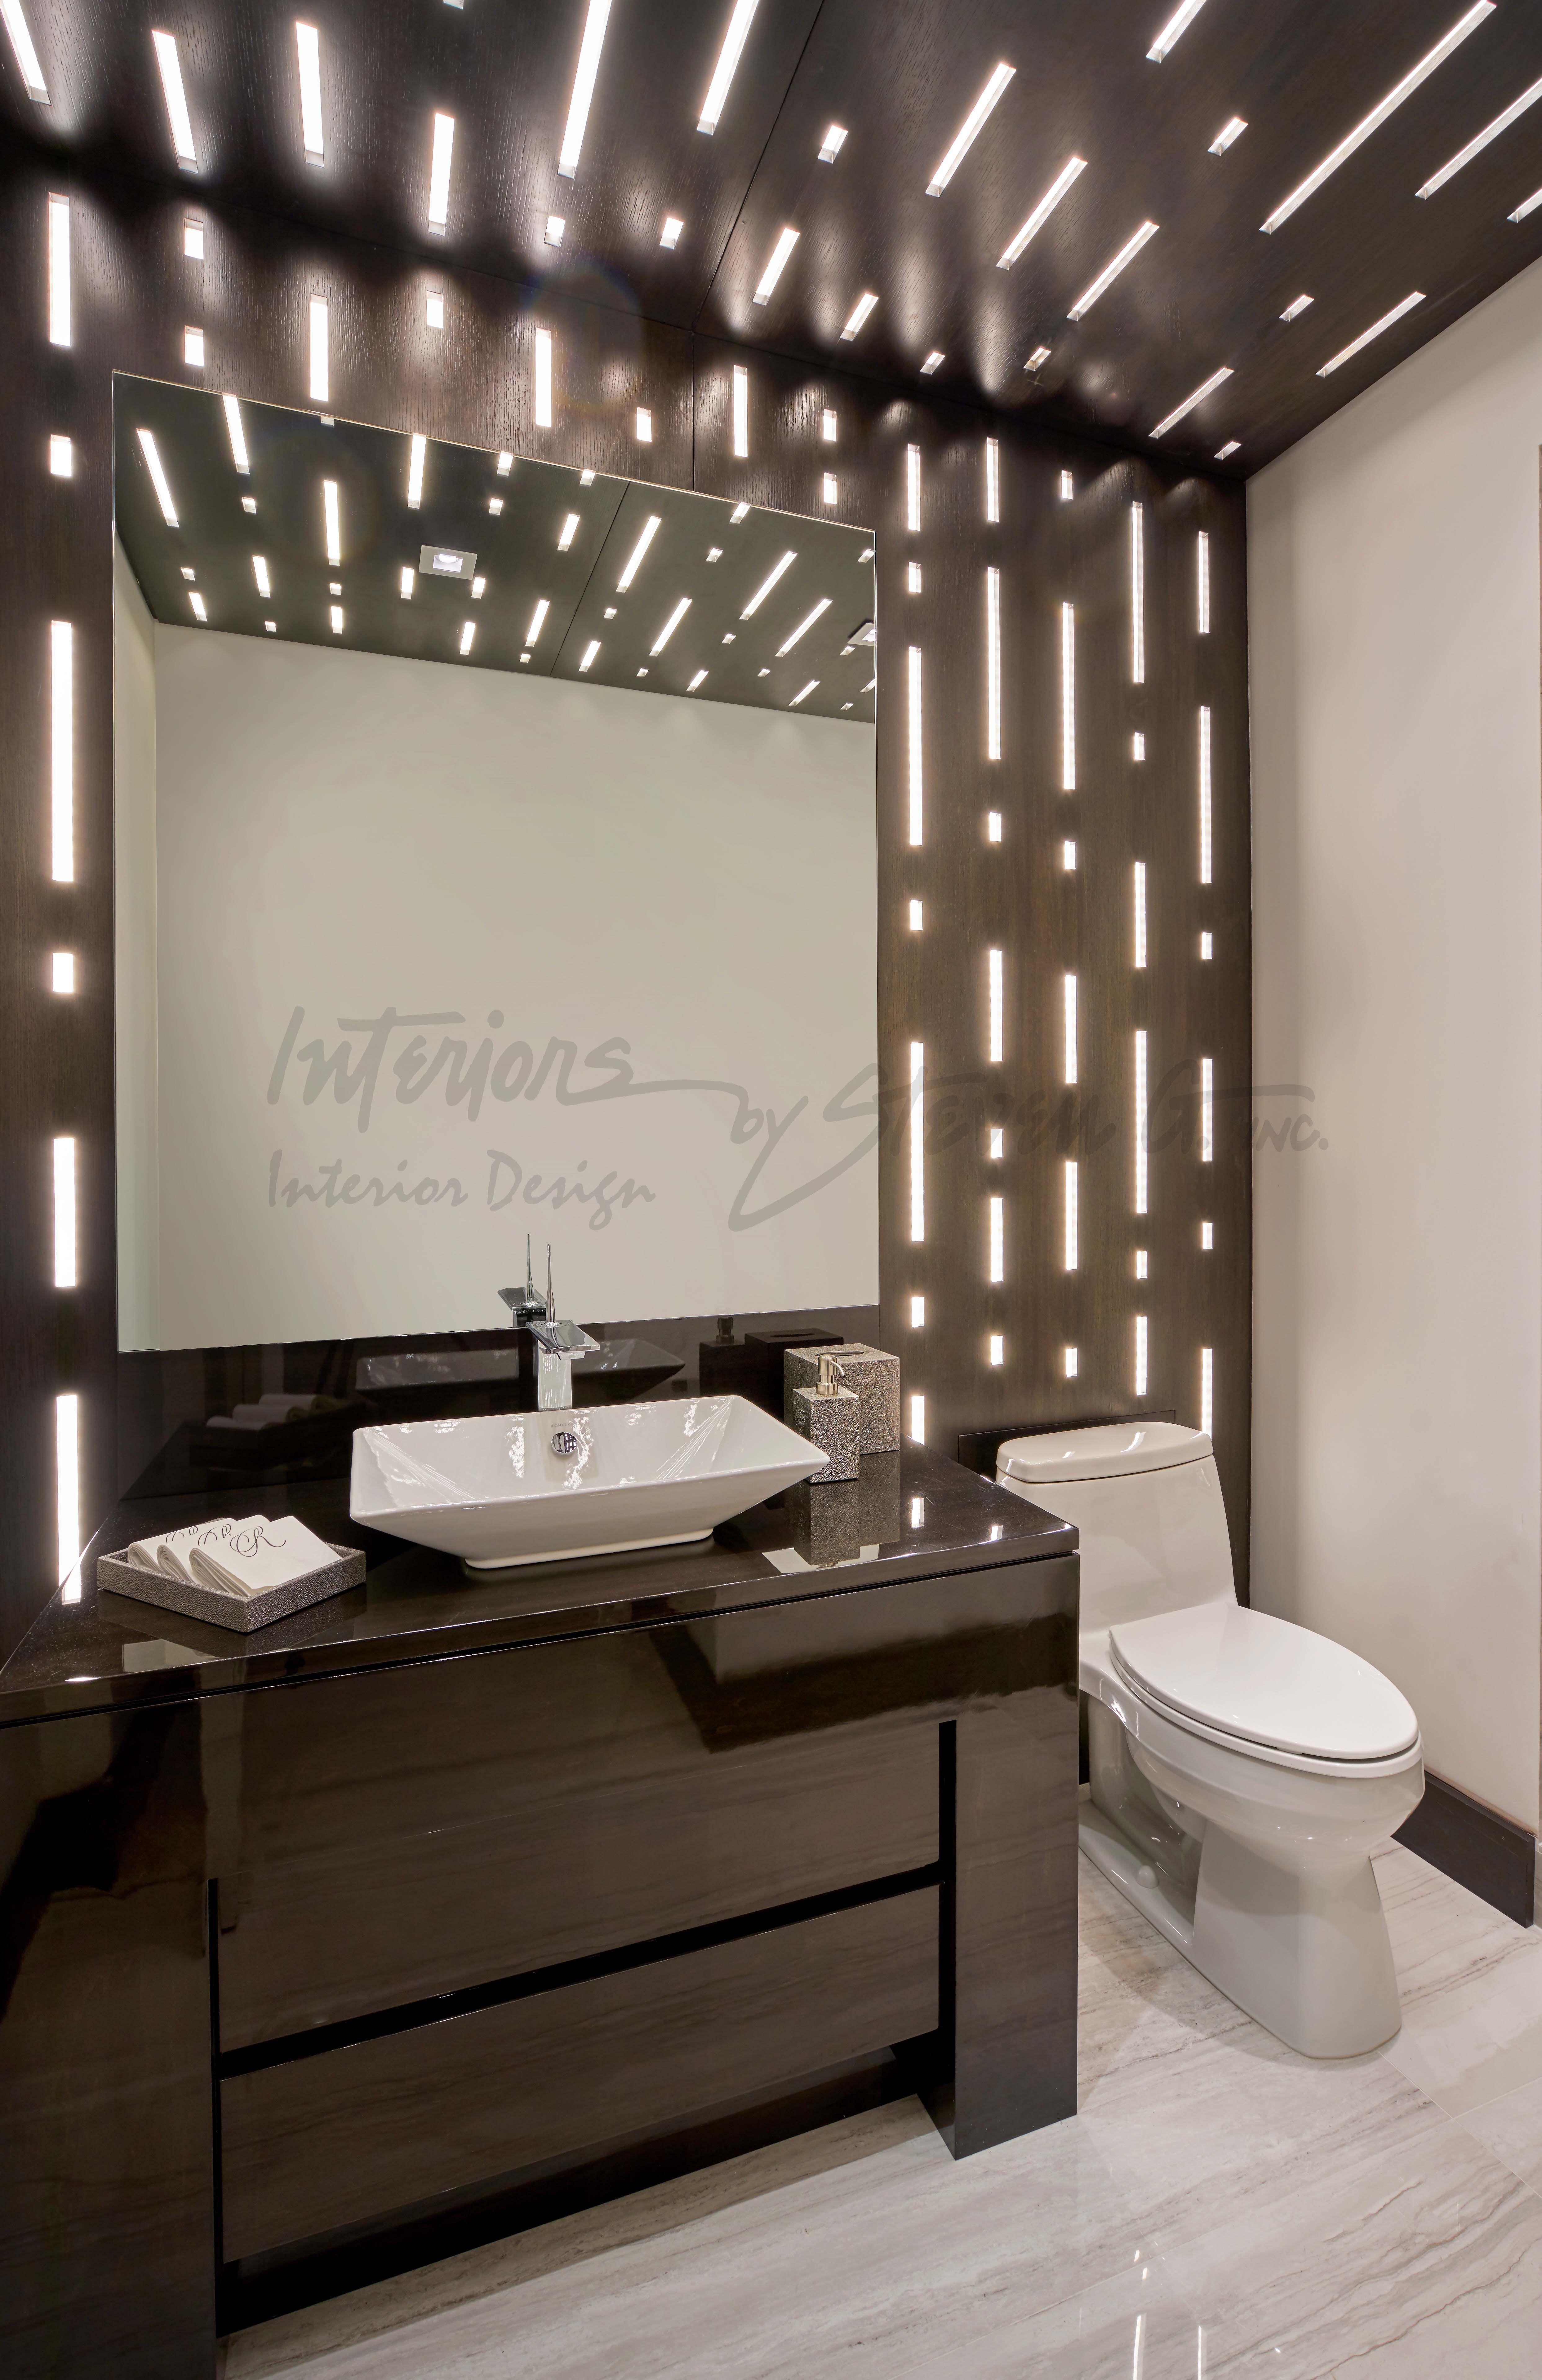 Guest Bathroom Guest Bathroom Interior Framed Bathroom Mirror